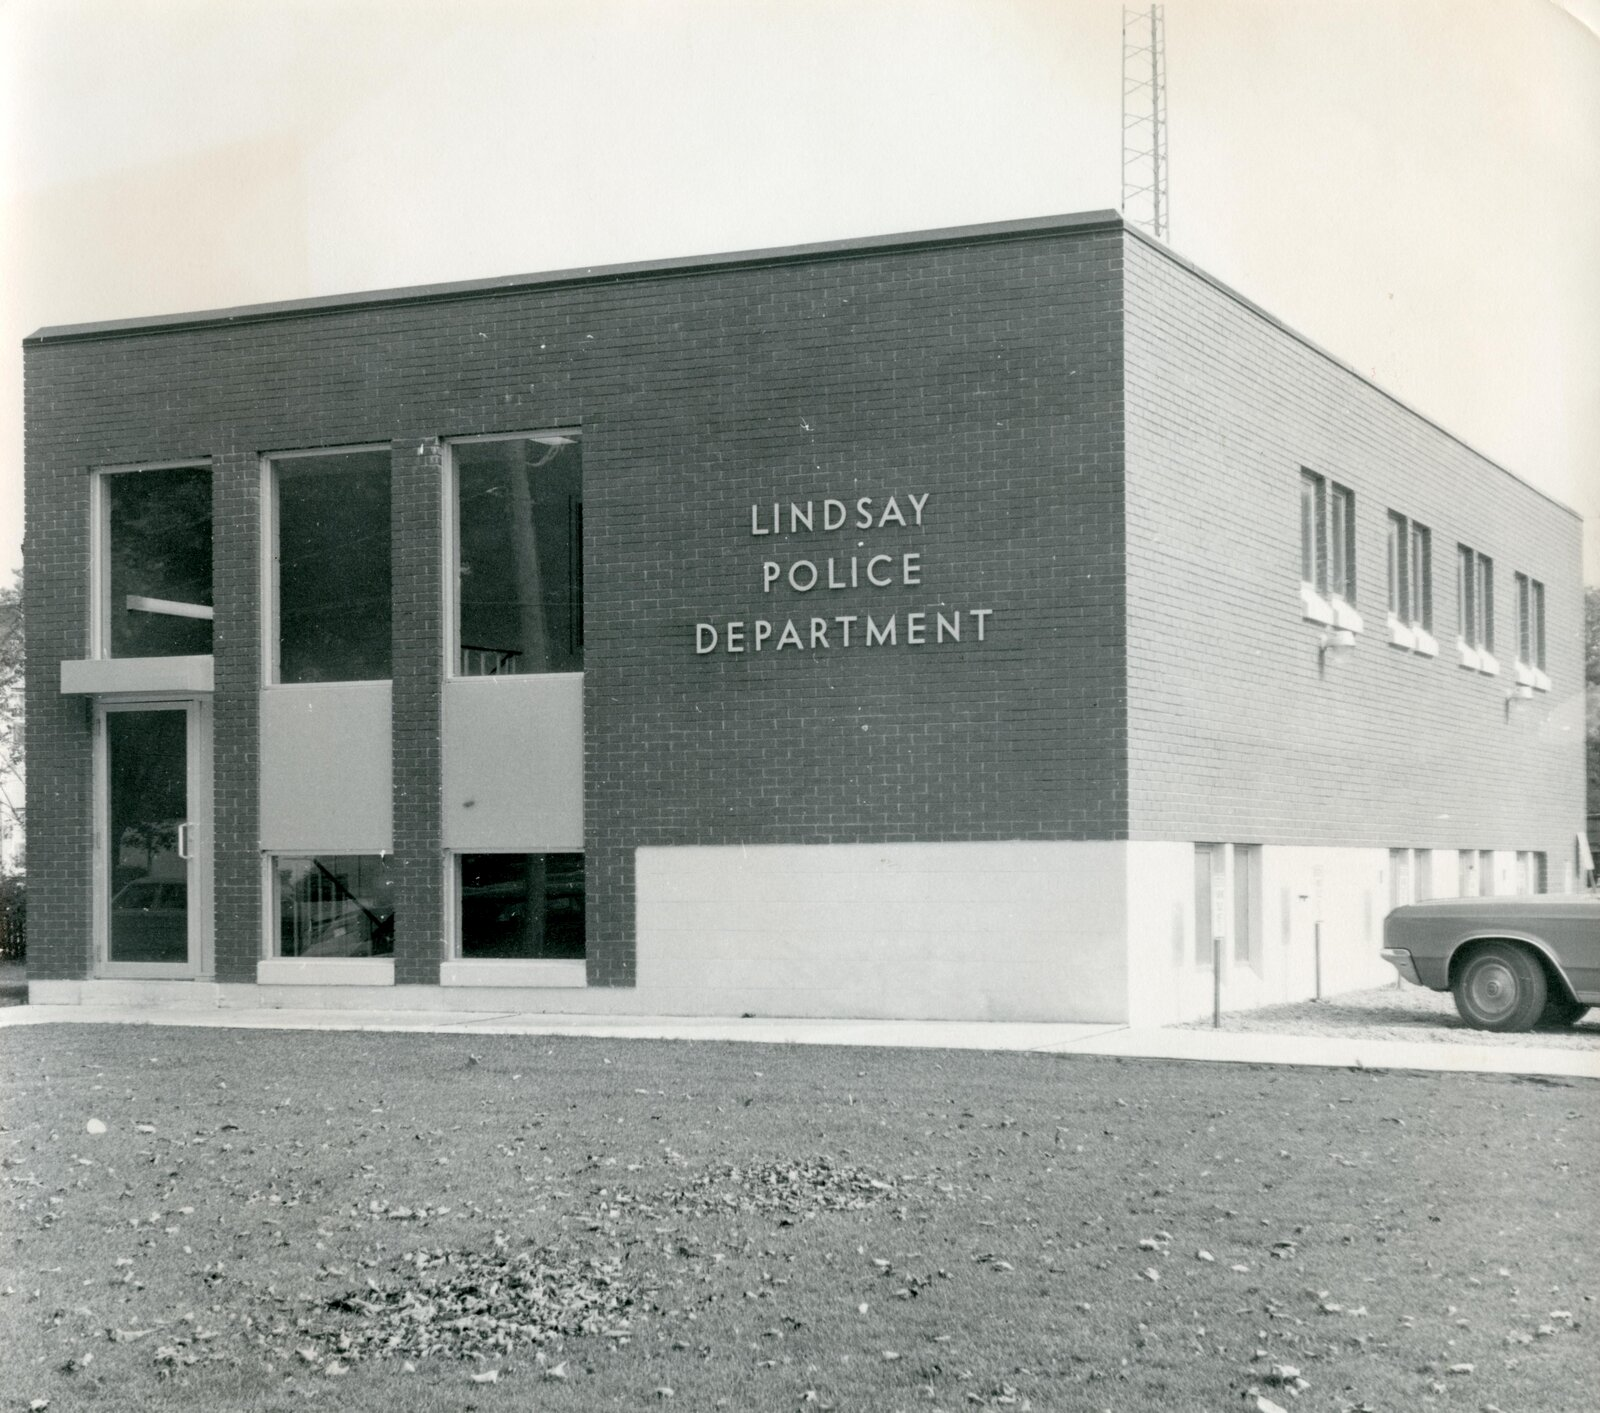 Police Department, Lindsay